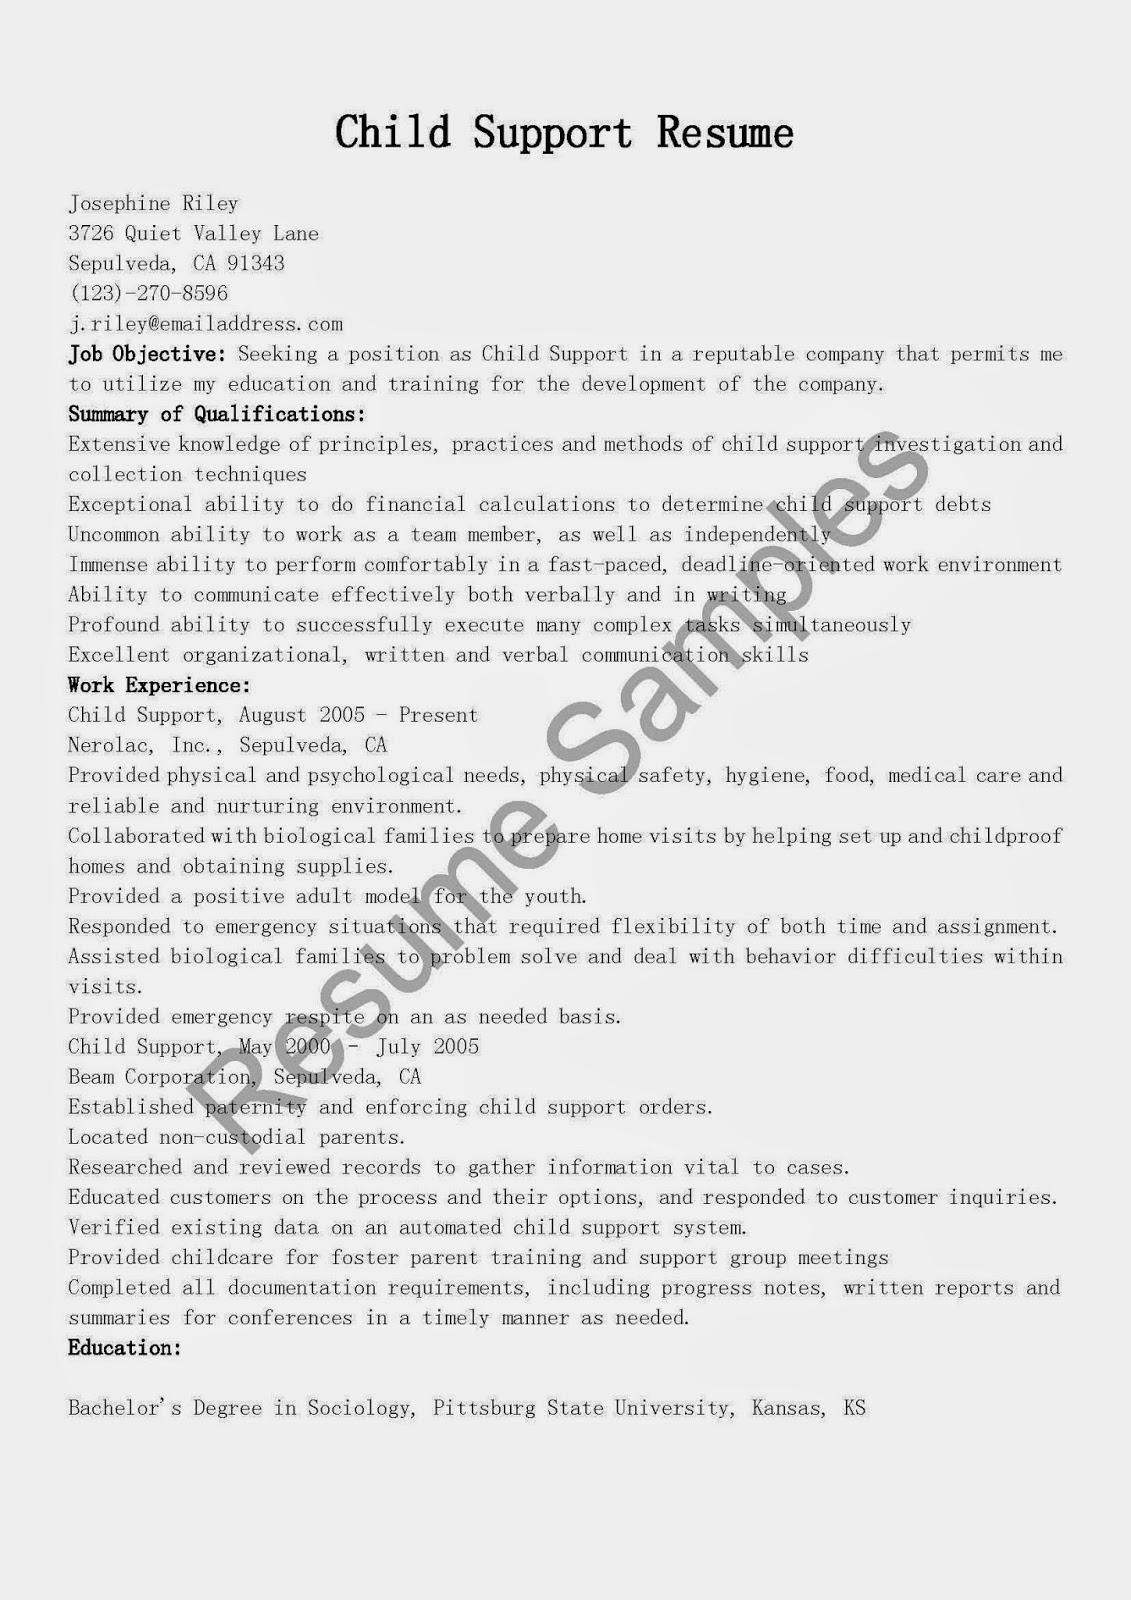 resume self employed self employed handyman resume sample sample - Handyman Resume Samples